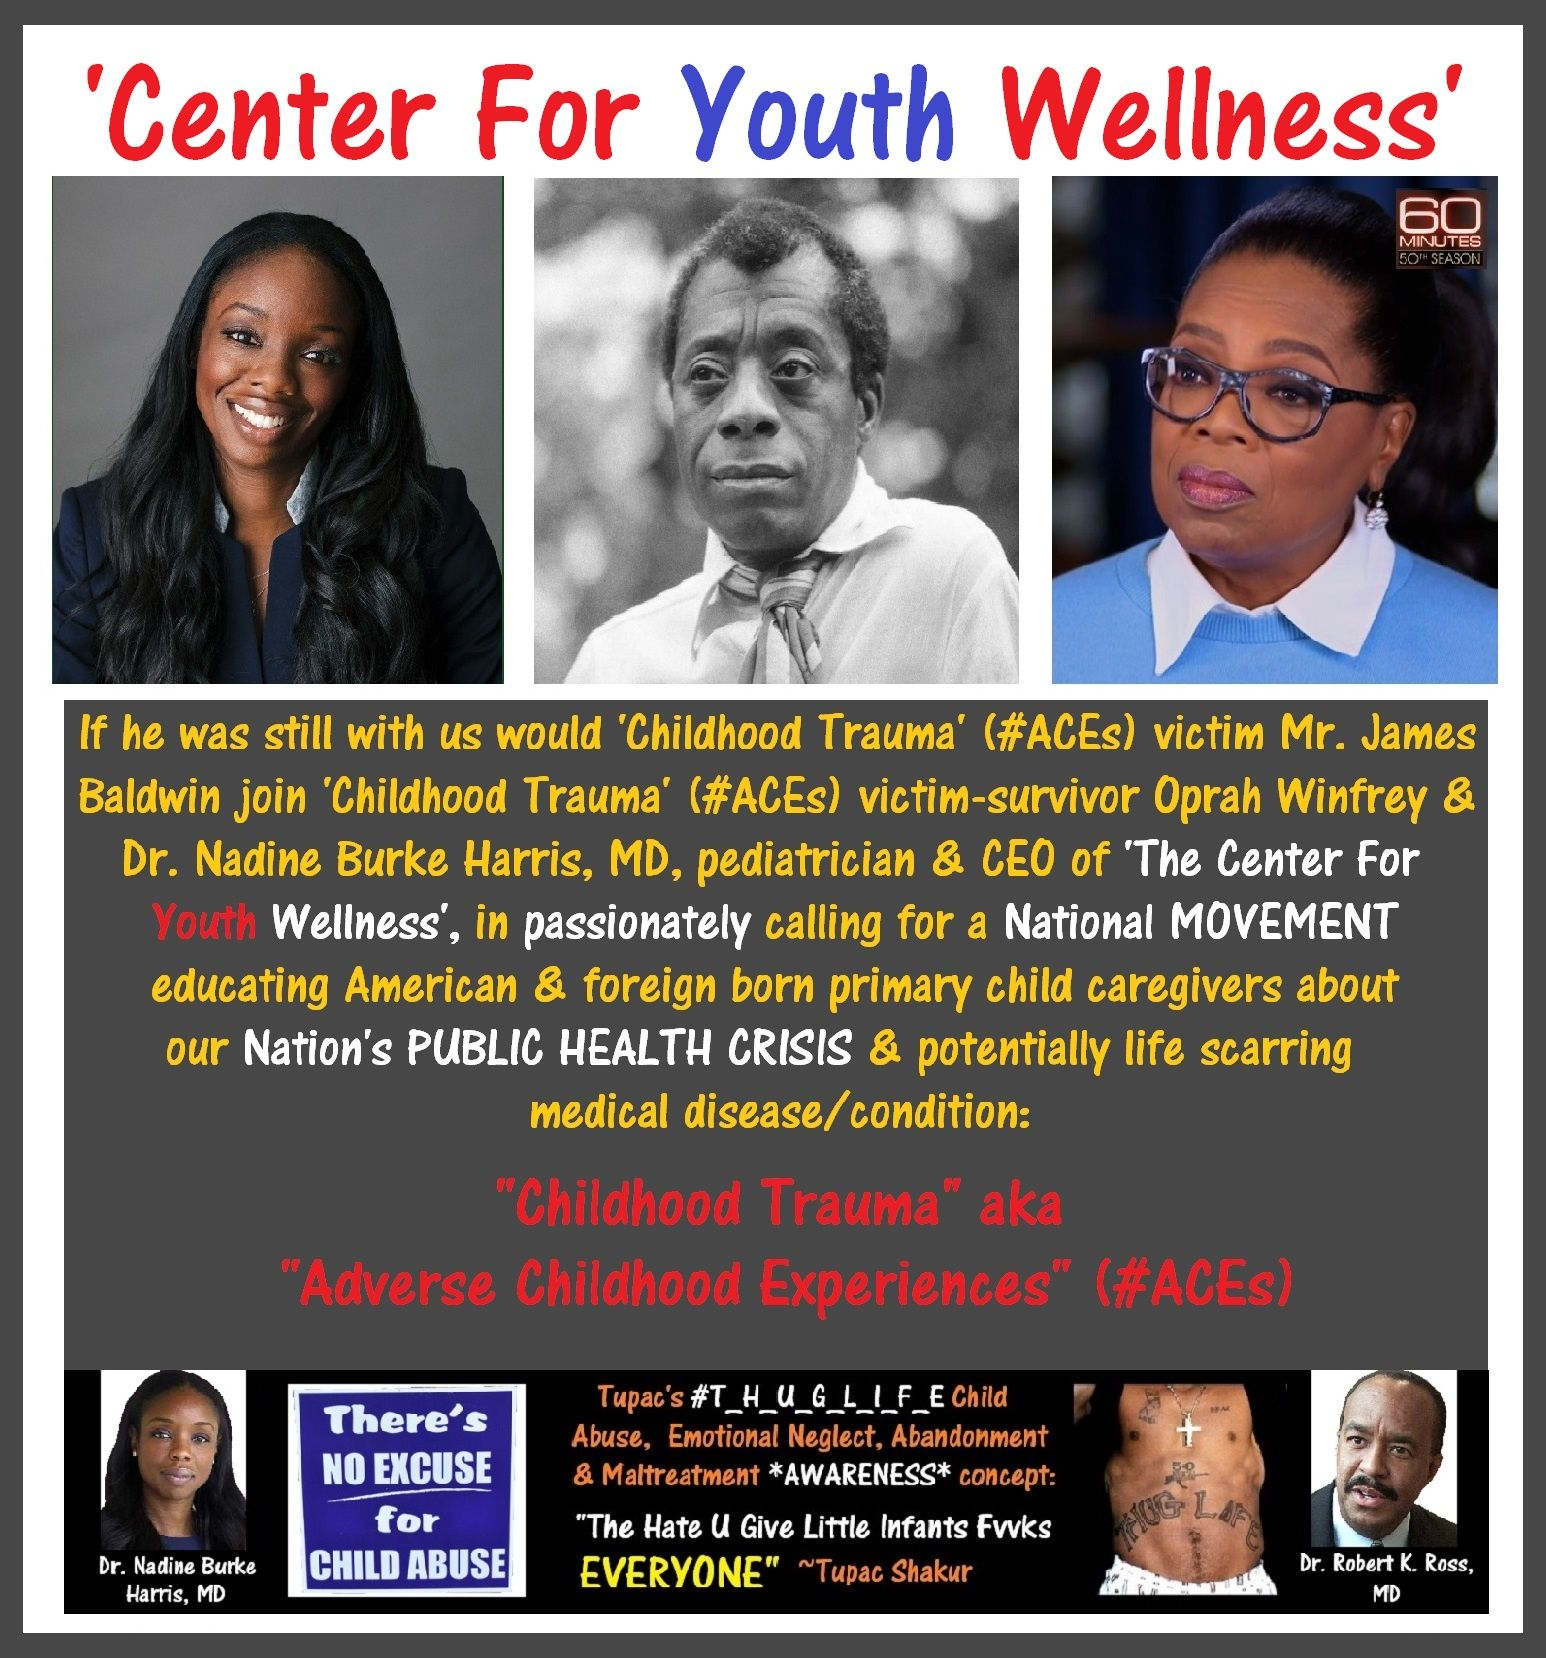 James Baldwin oprah winfrey dr nadine burke harris.jpg